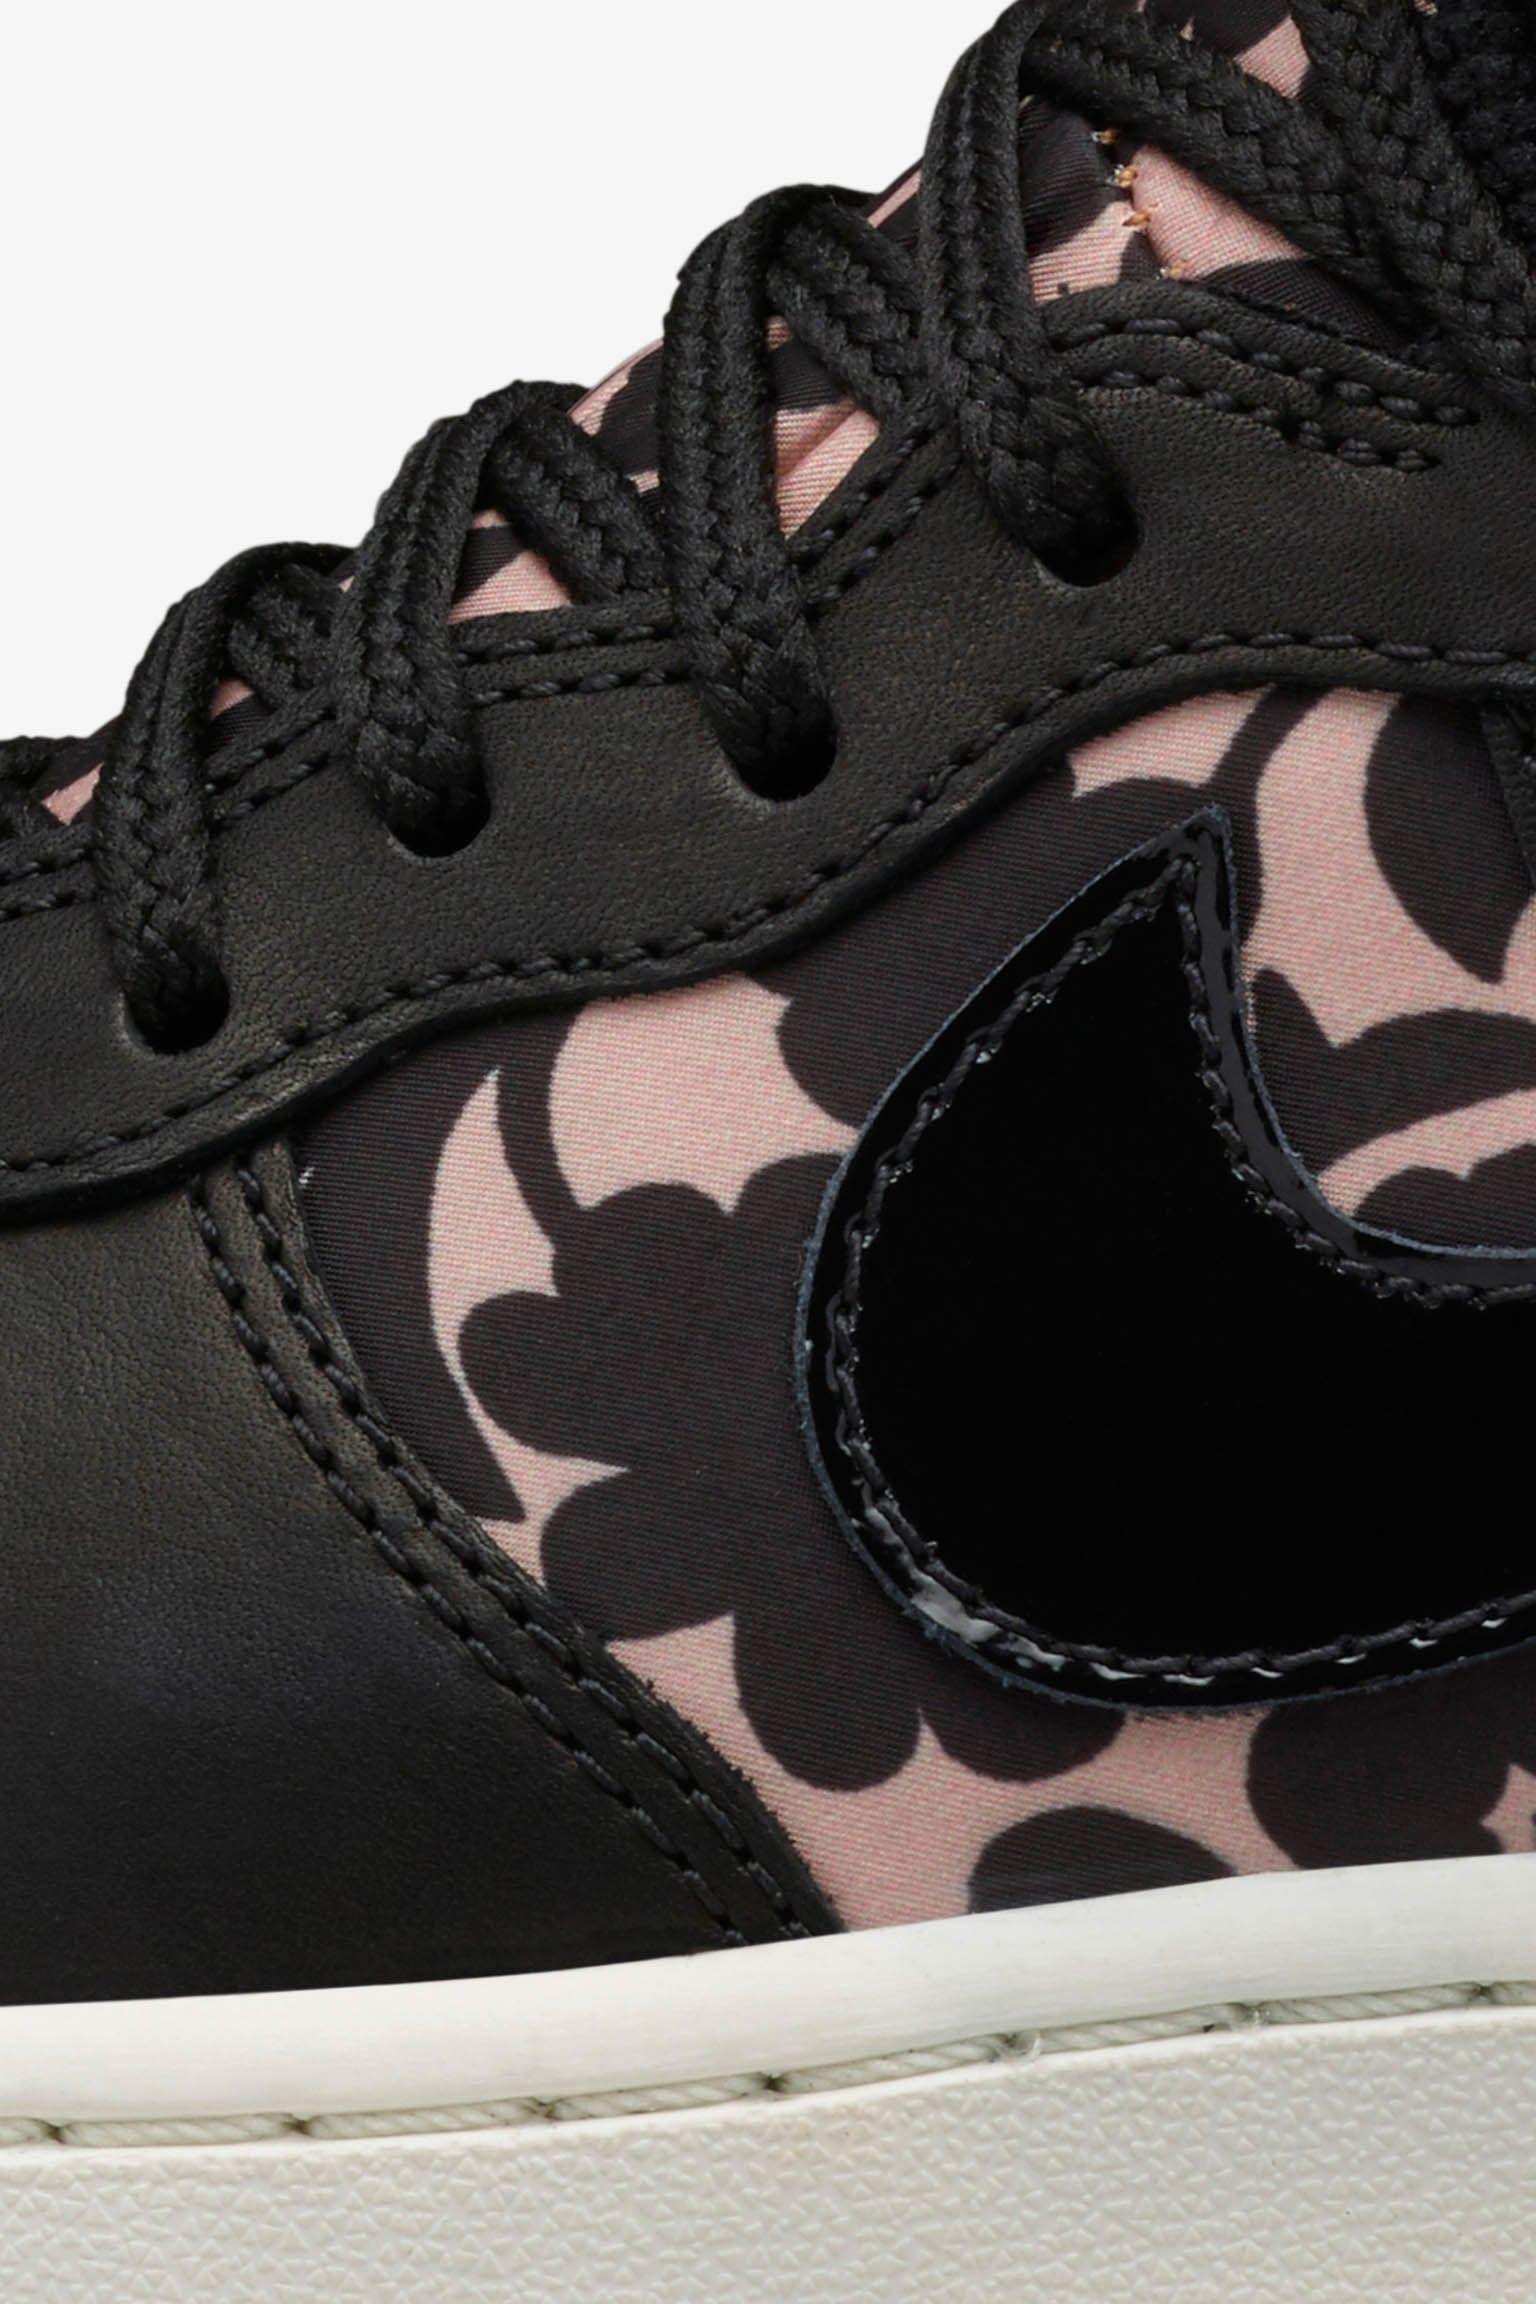 Liberty x Women's Nike Air Force 1 Hi 'Cameo'